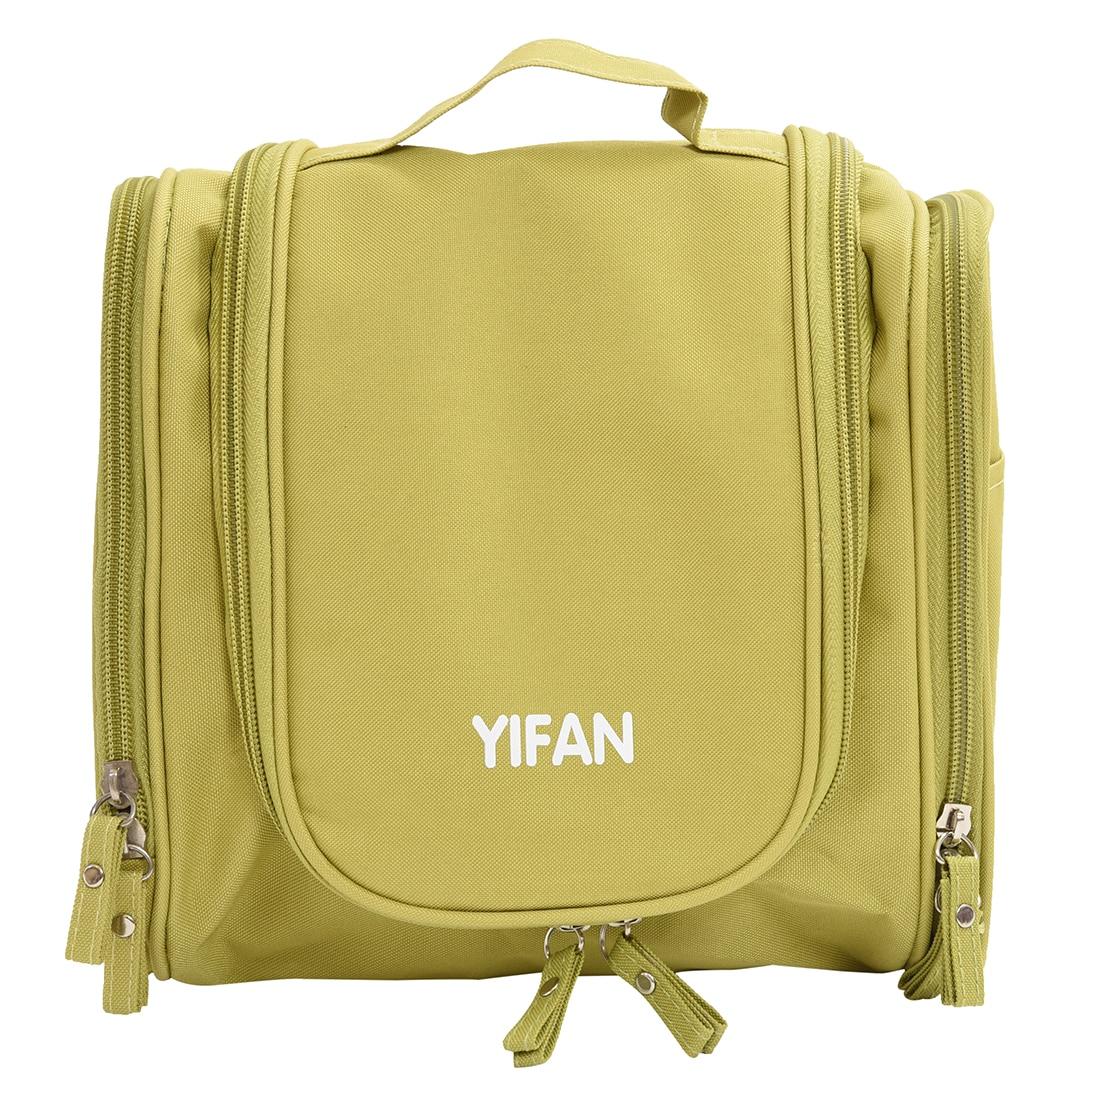 5 X SNNY Waterproof Travel Cosmetic Bag Organizer Toiletry Makeup Bag Organizador Wash Make Up Bag Bolsa Neceser Maquillaje Case